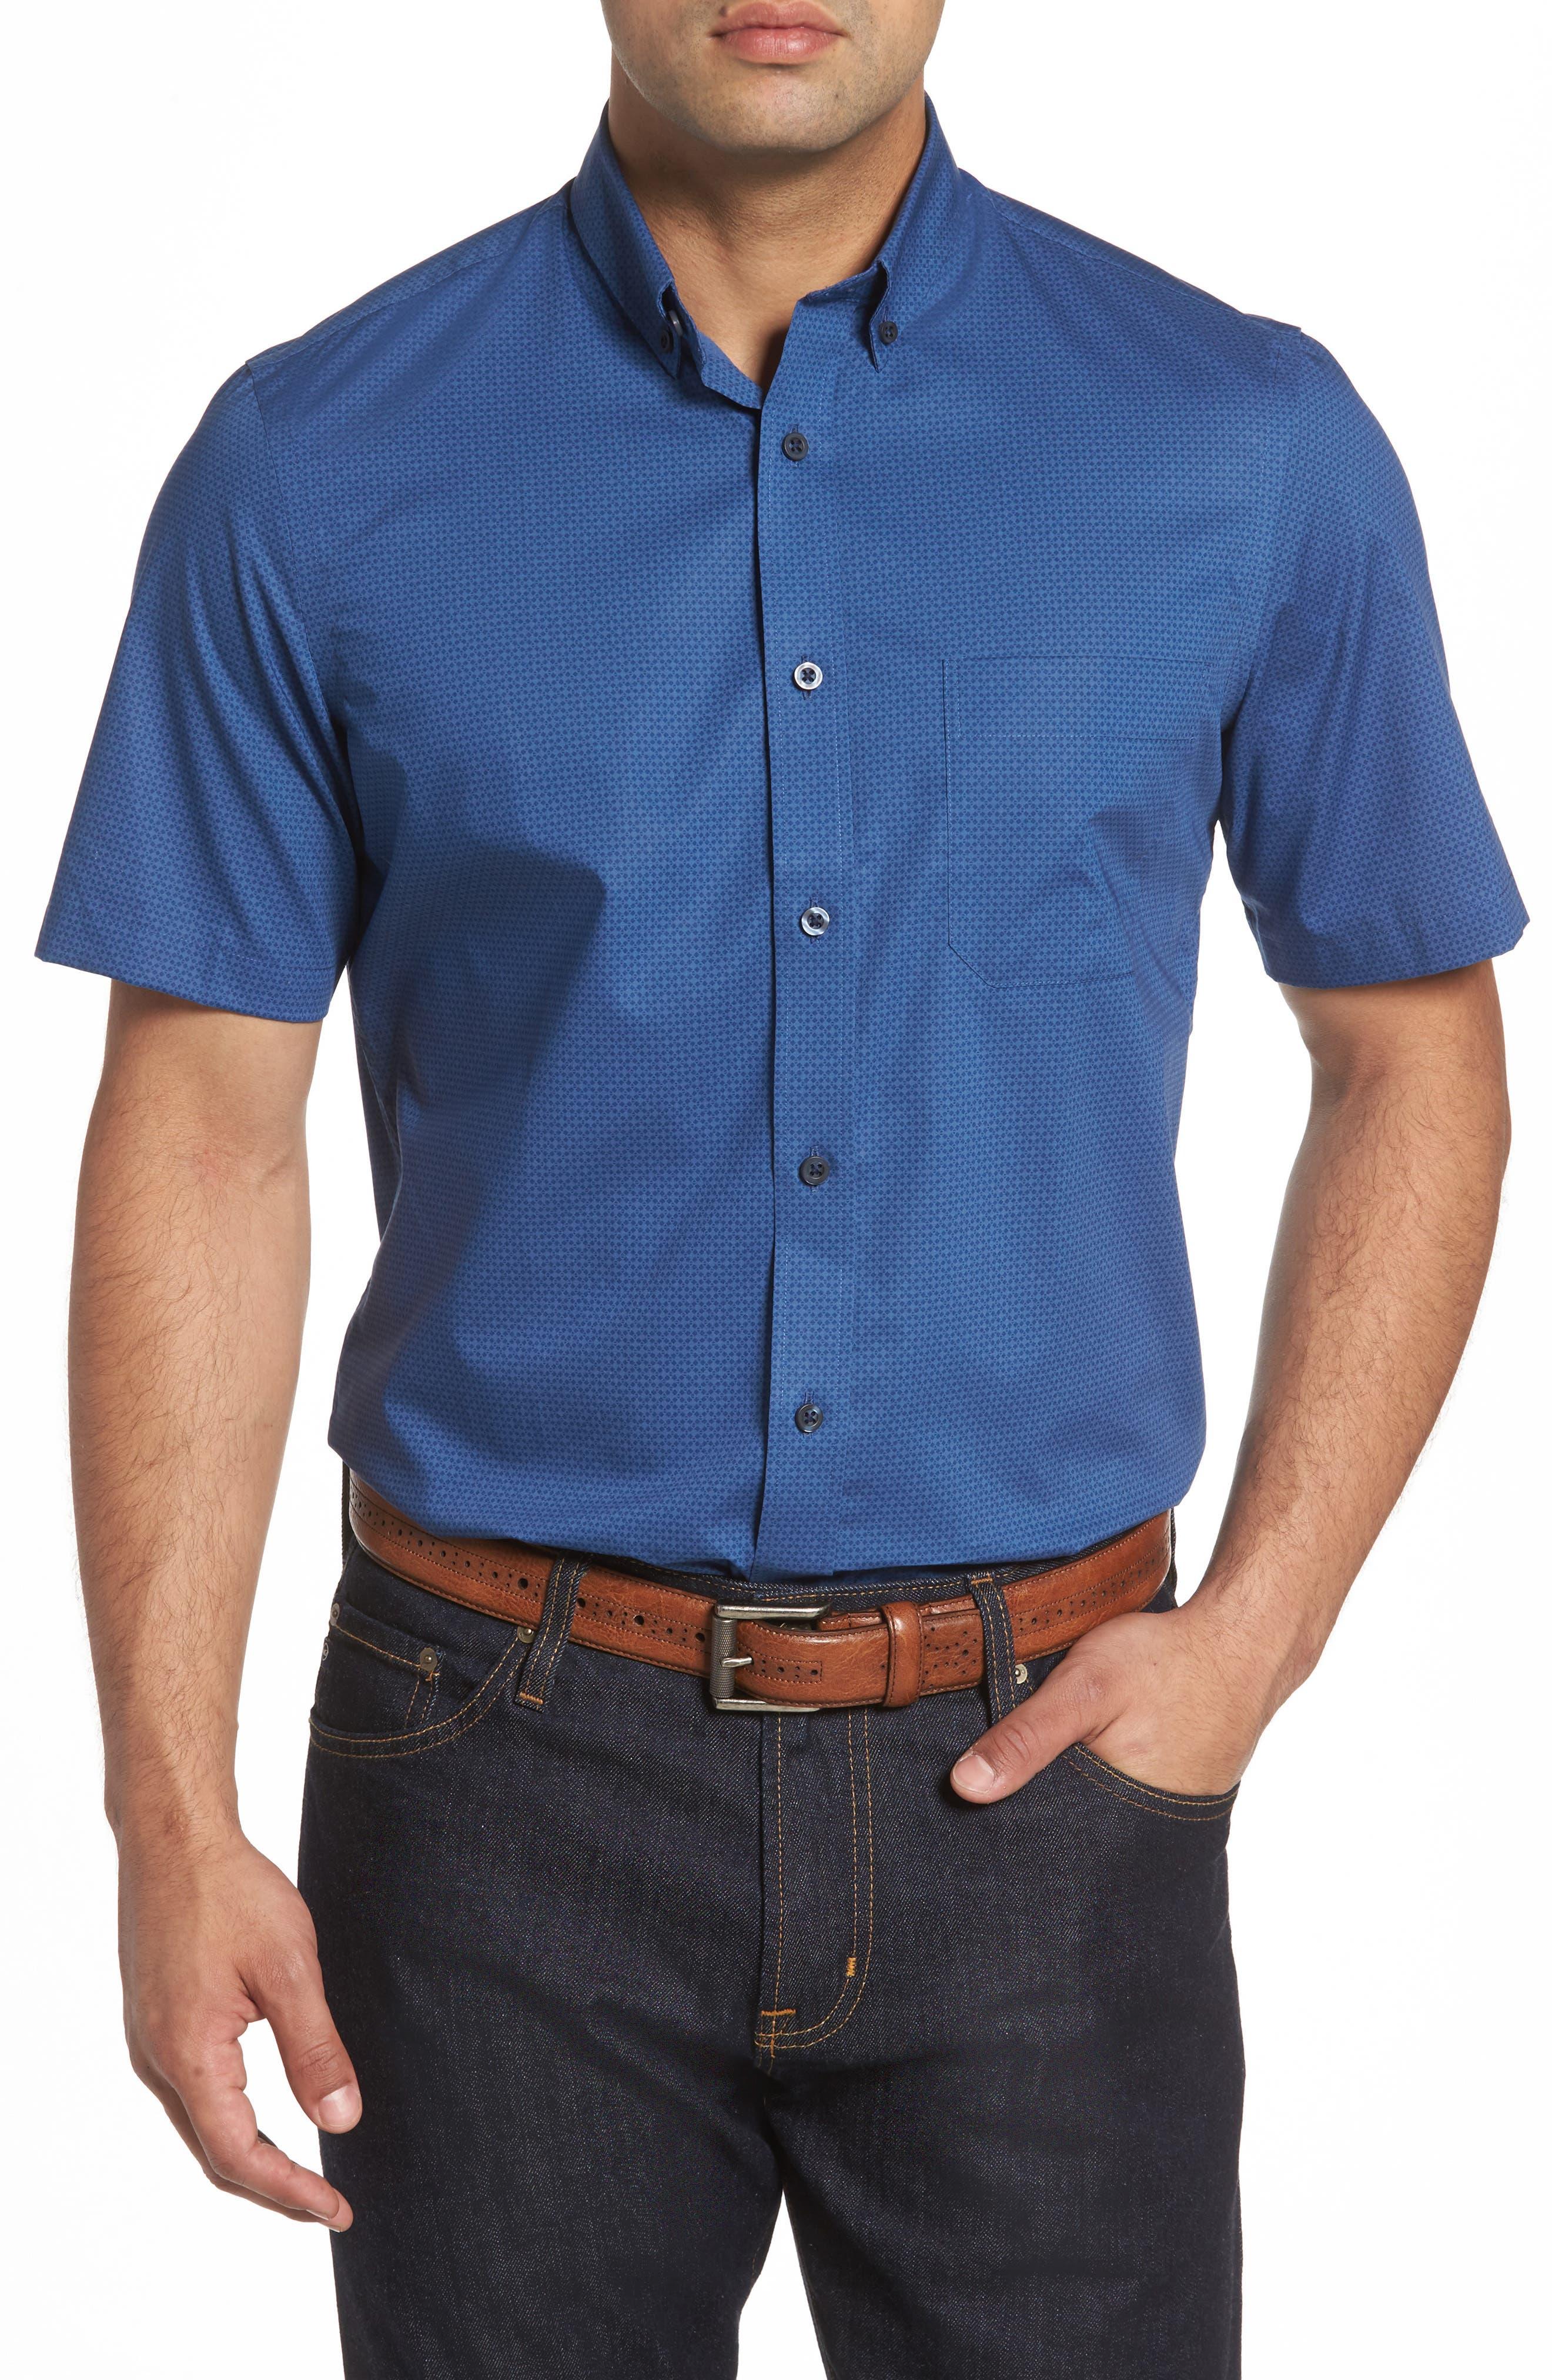 Nordstrom Men's Shop Regular Fit Non-Iron Print Sport Shirt (Big & Tall)